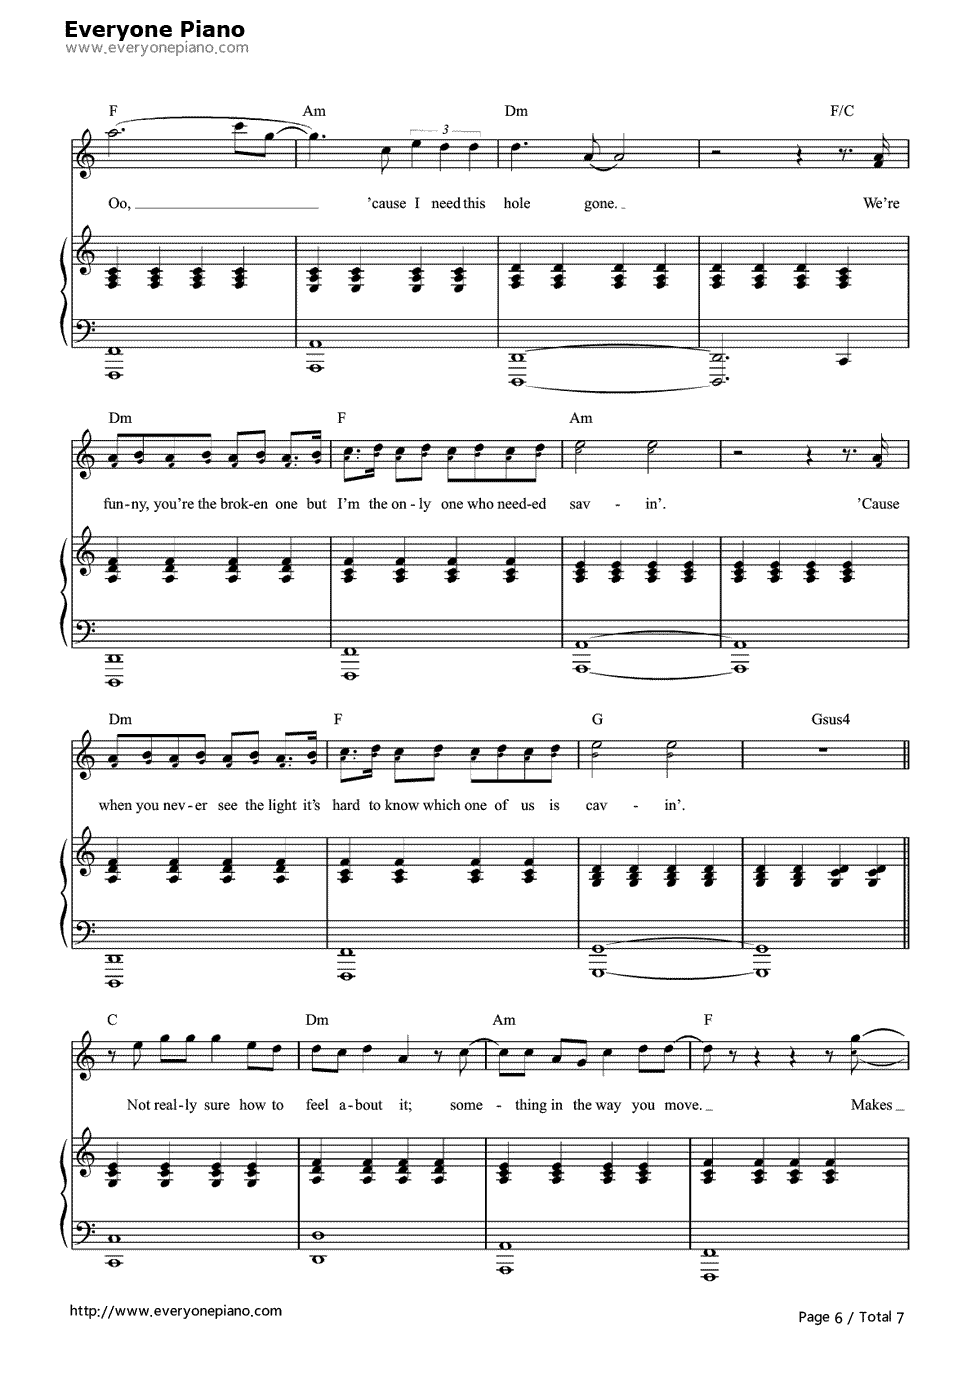 Free stay rihanna and mikky ekko sheet music preview 6 page 6 free stay rihanna and mikky ekko sheet music preview 6 page 6 hexwebz Gallery